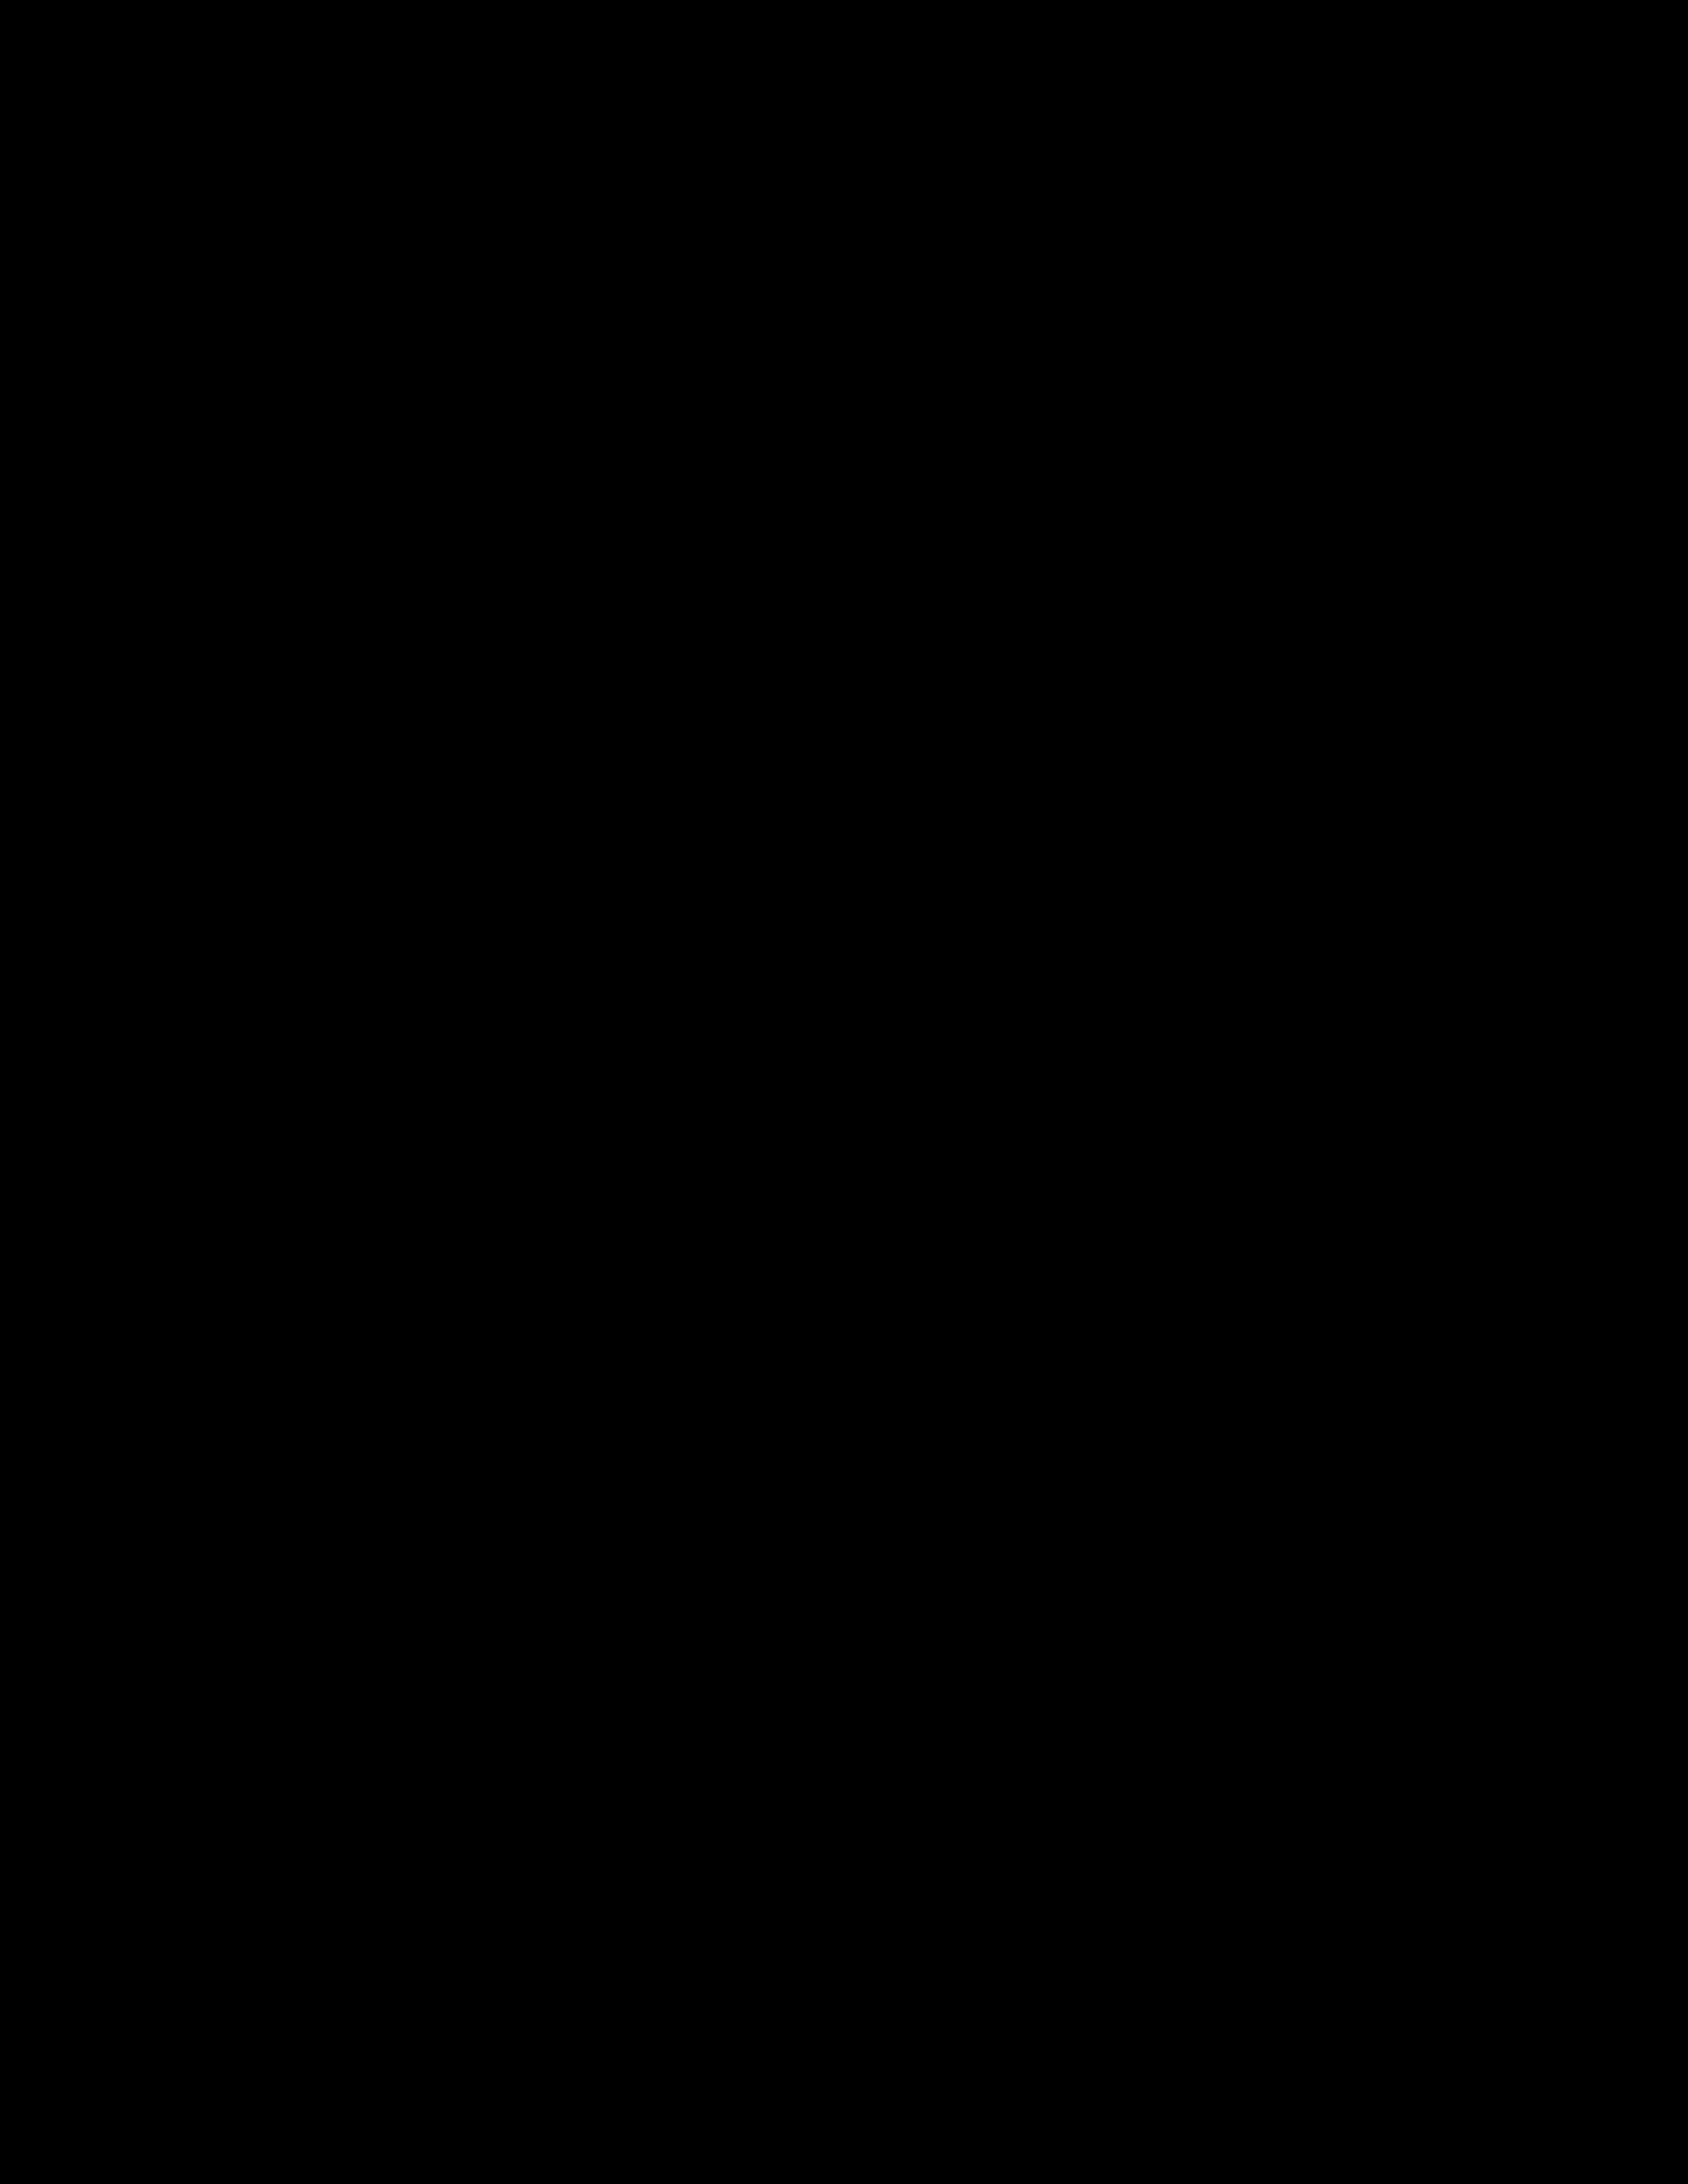 2000x2588 Filealphabet F